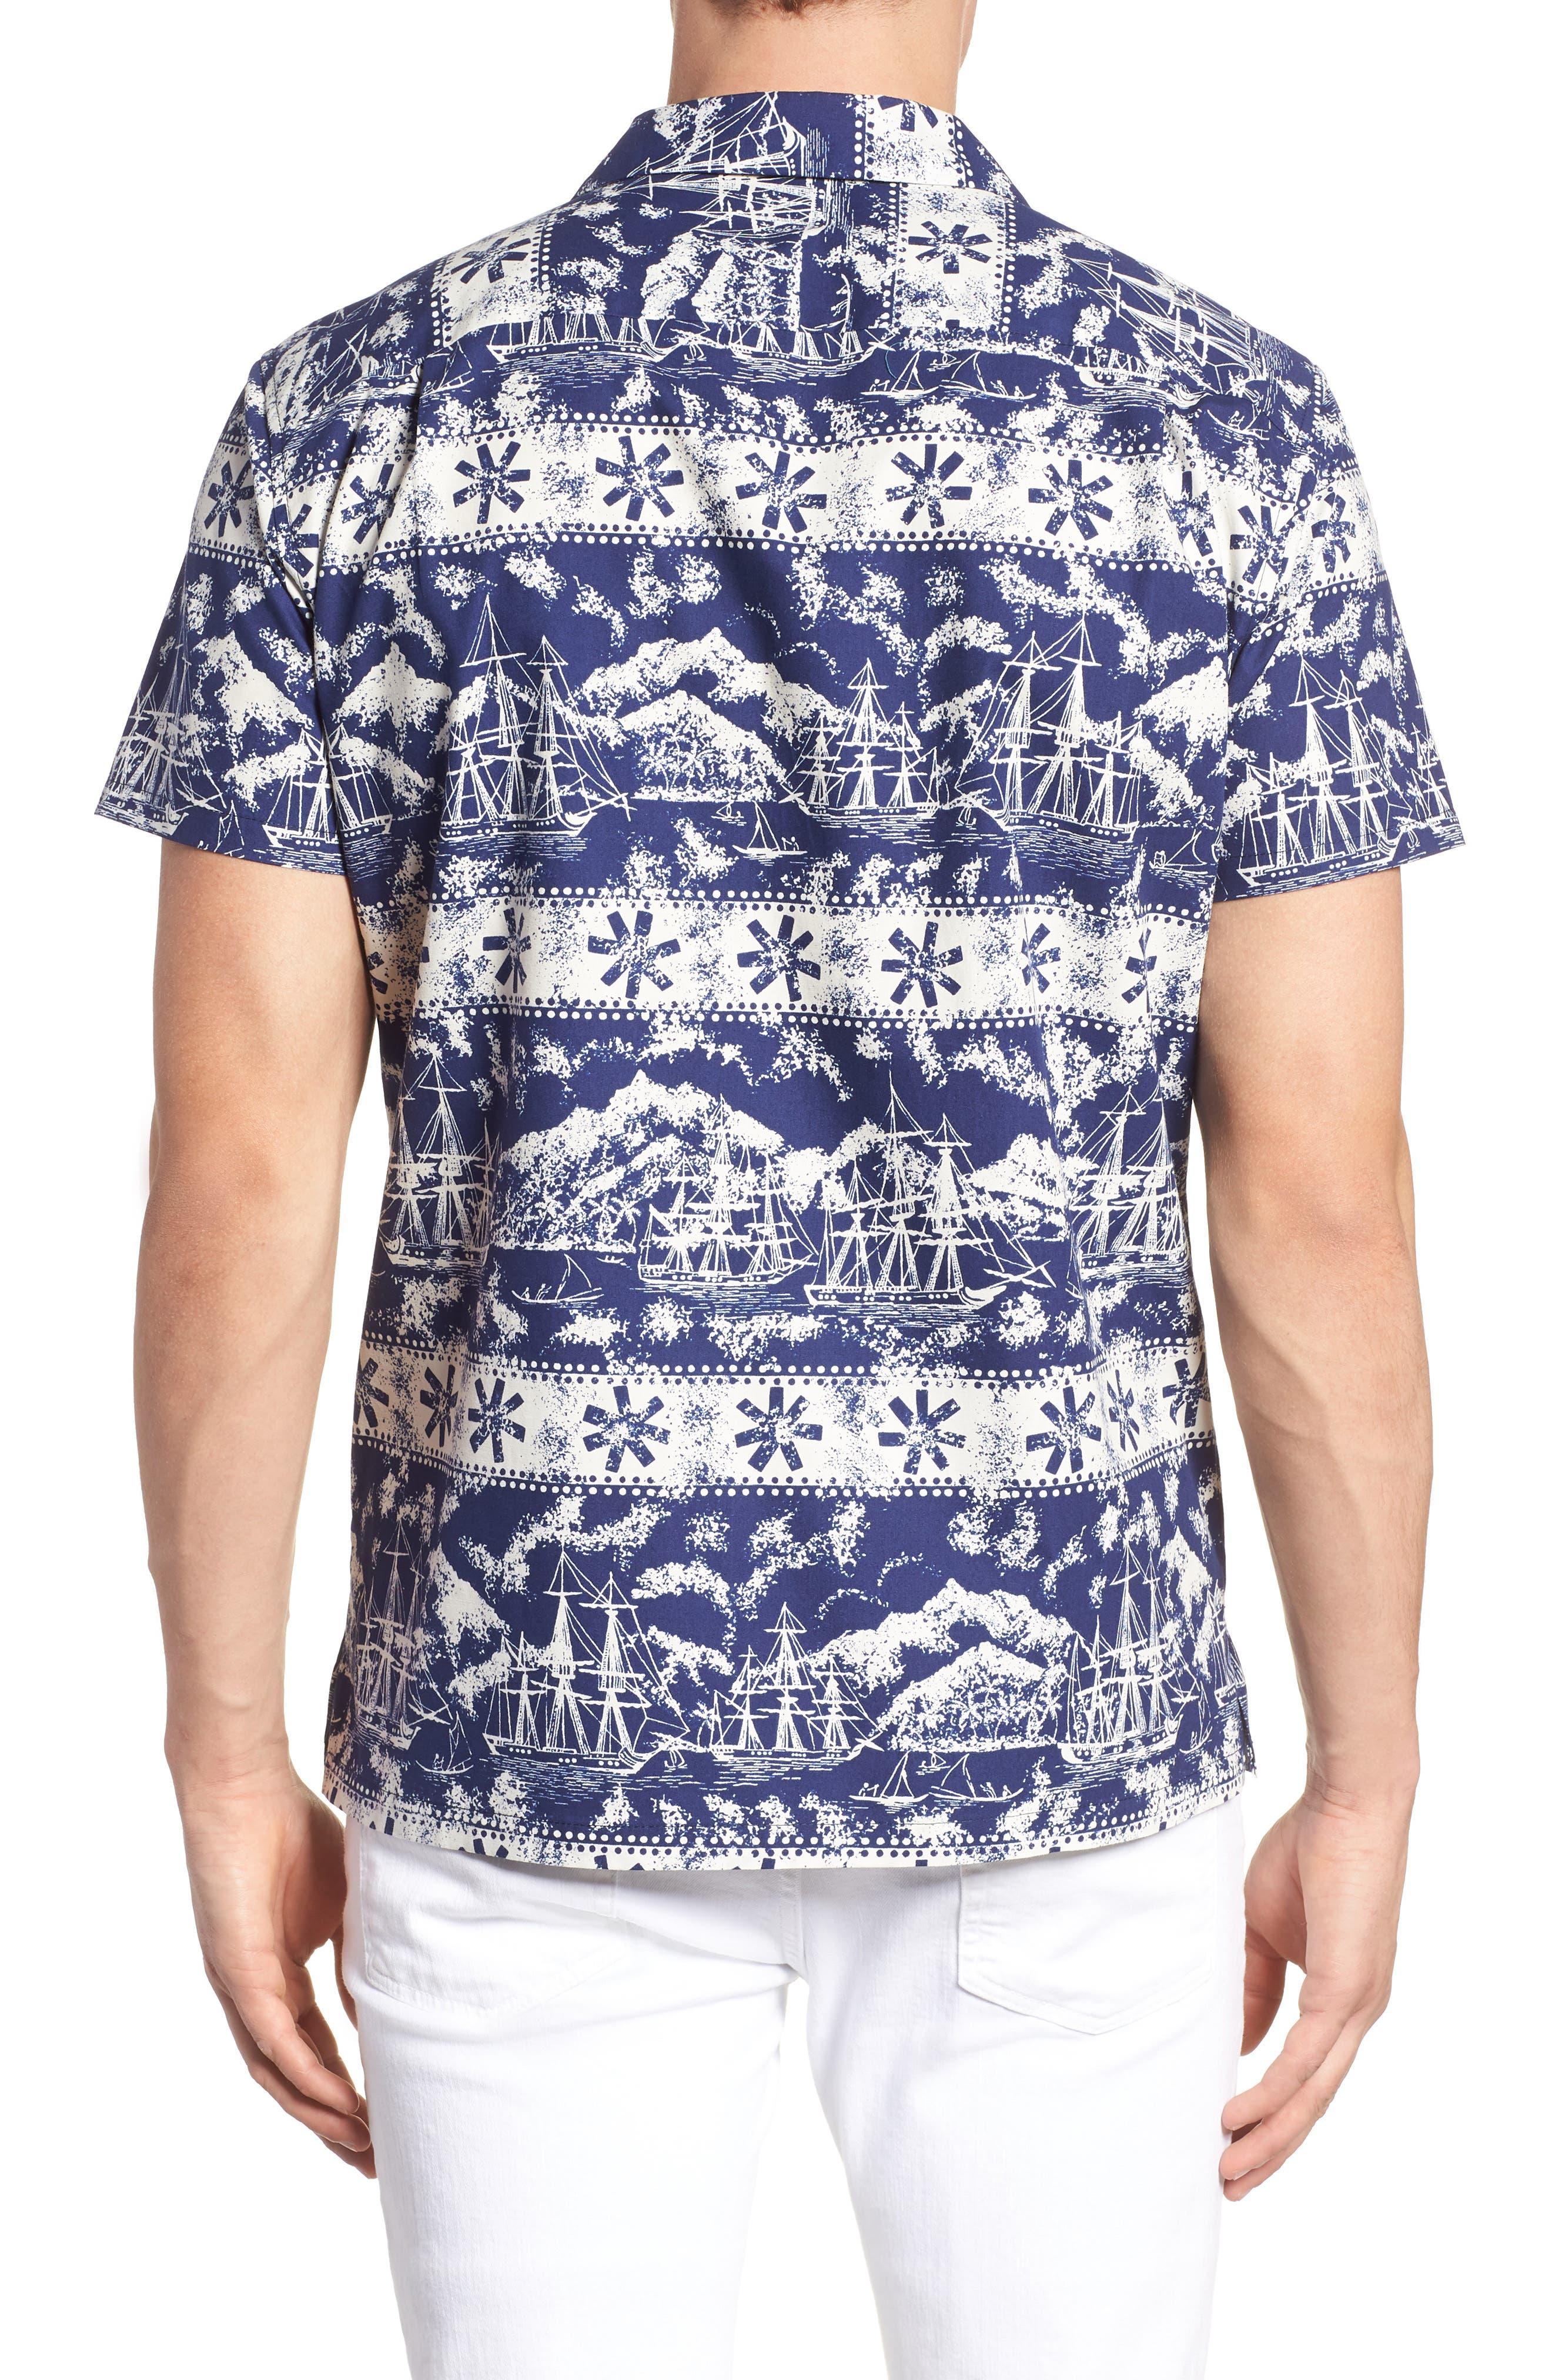 Safe Harbor Slim Fit Camp Shirt,                             Alternate thumbnail 2, color,                             415